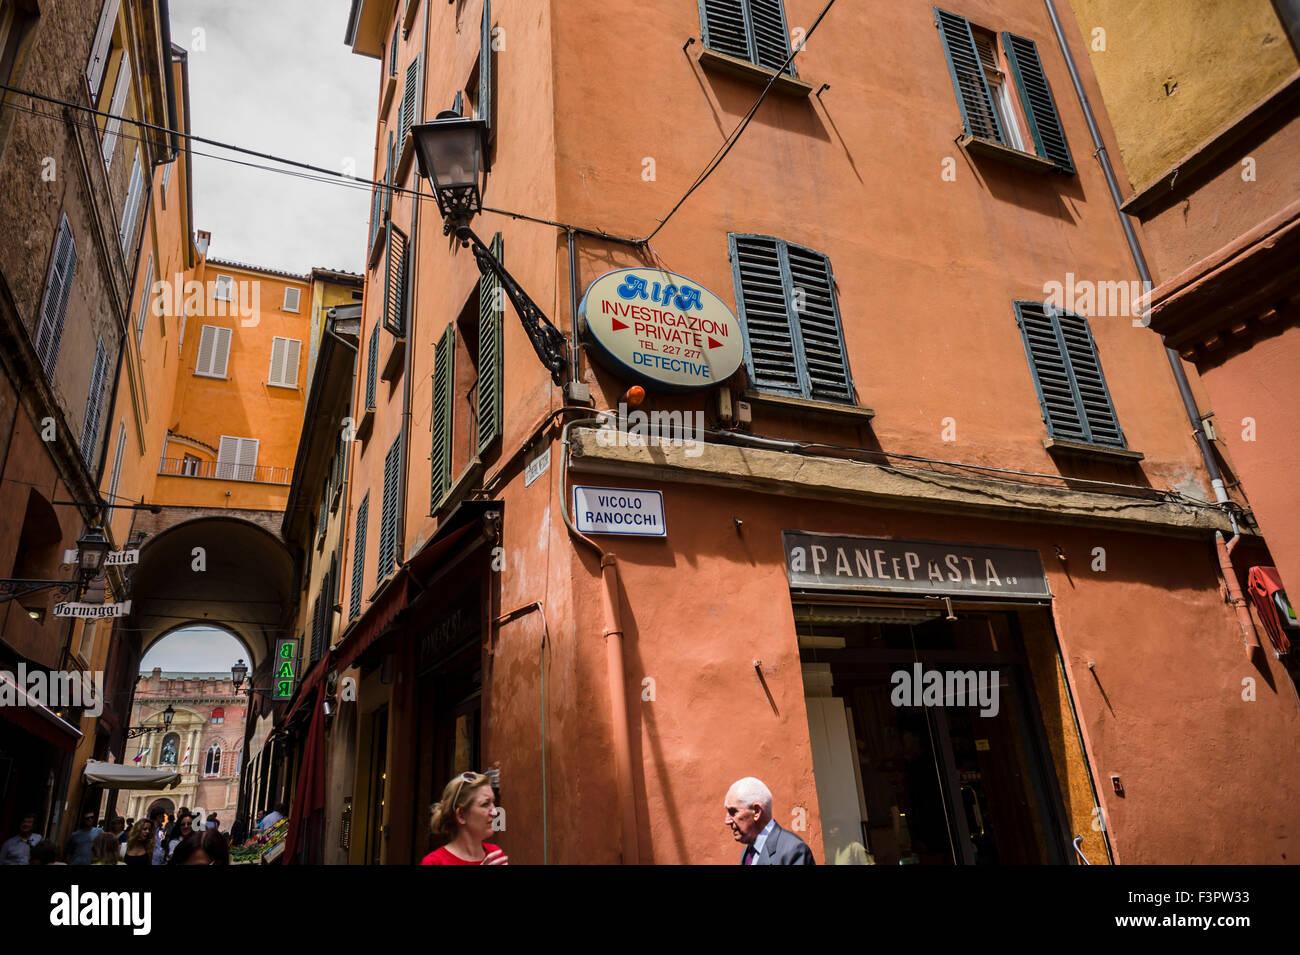 Italy, Emilia-Romagna region, Bologna - private detective agency. - Stock Image